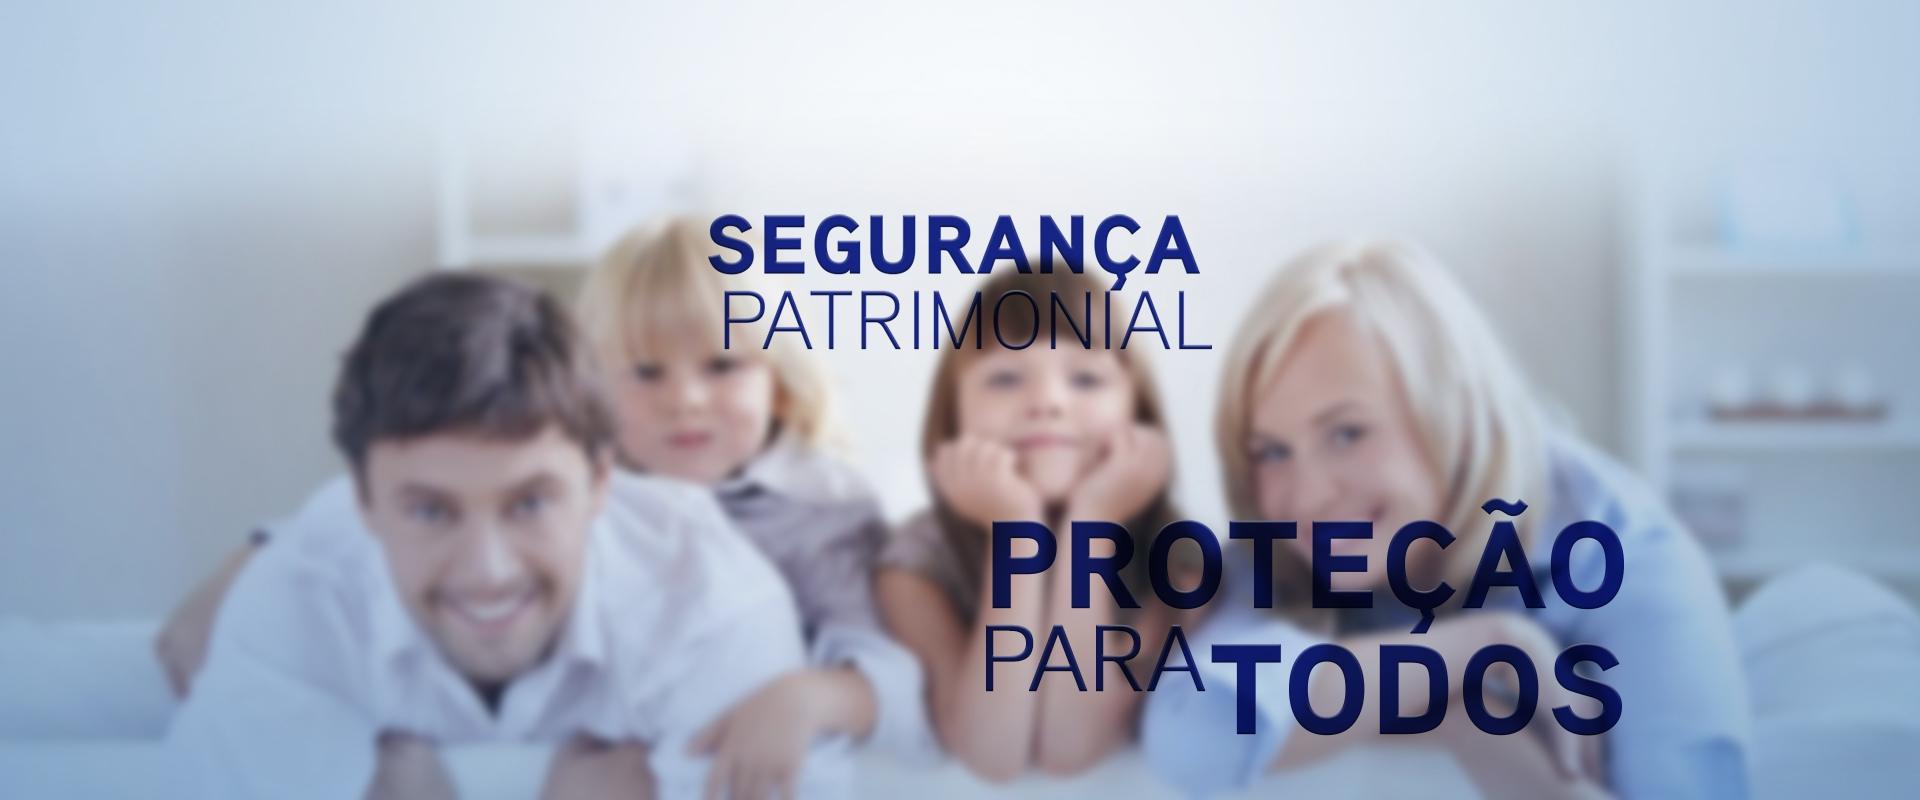 Segurança Patrimonial - Ingá Vigilância